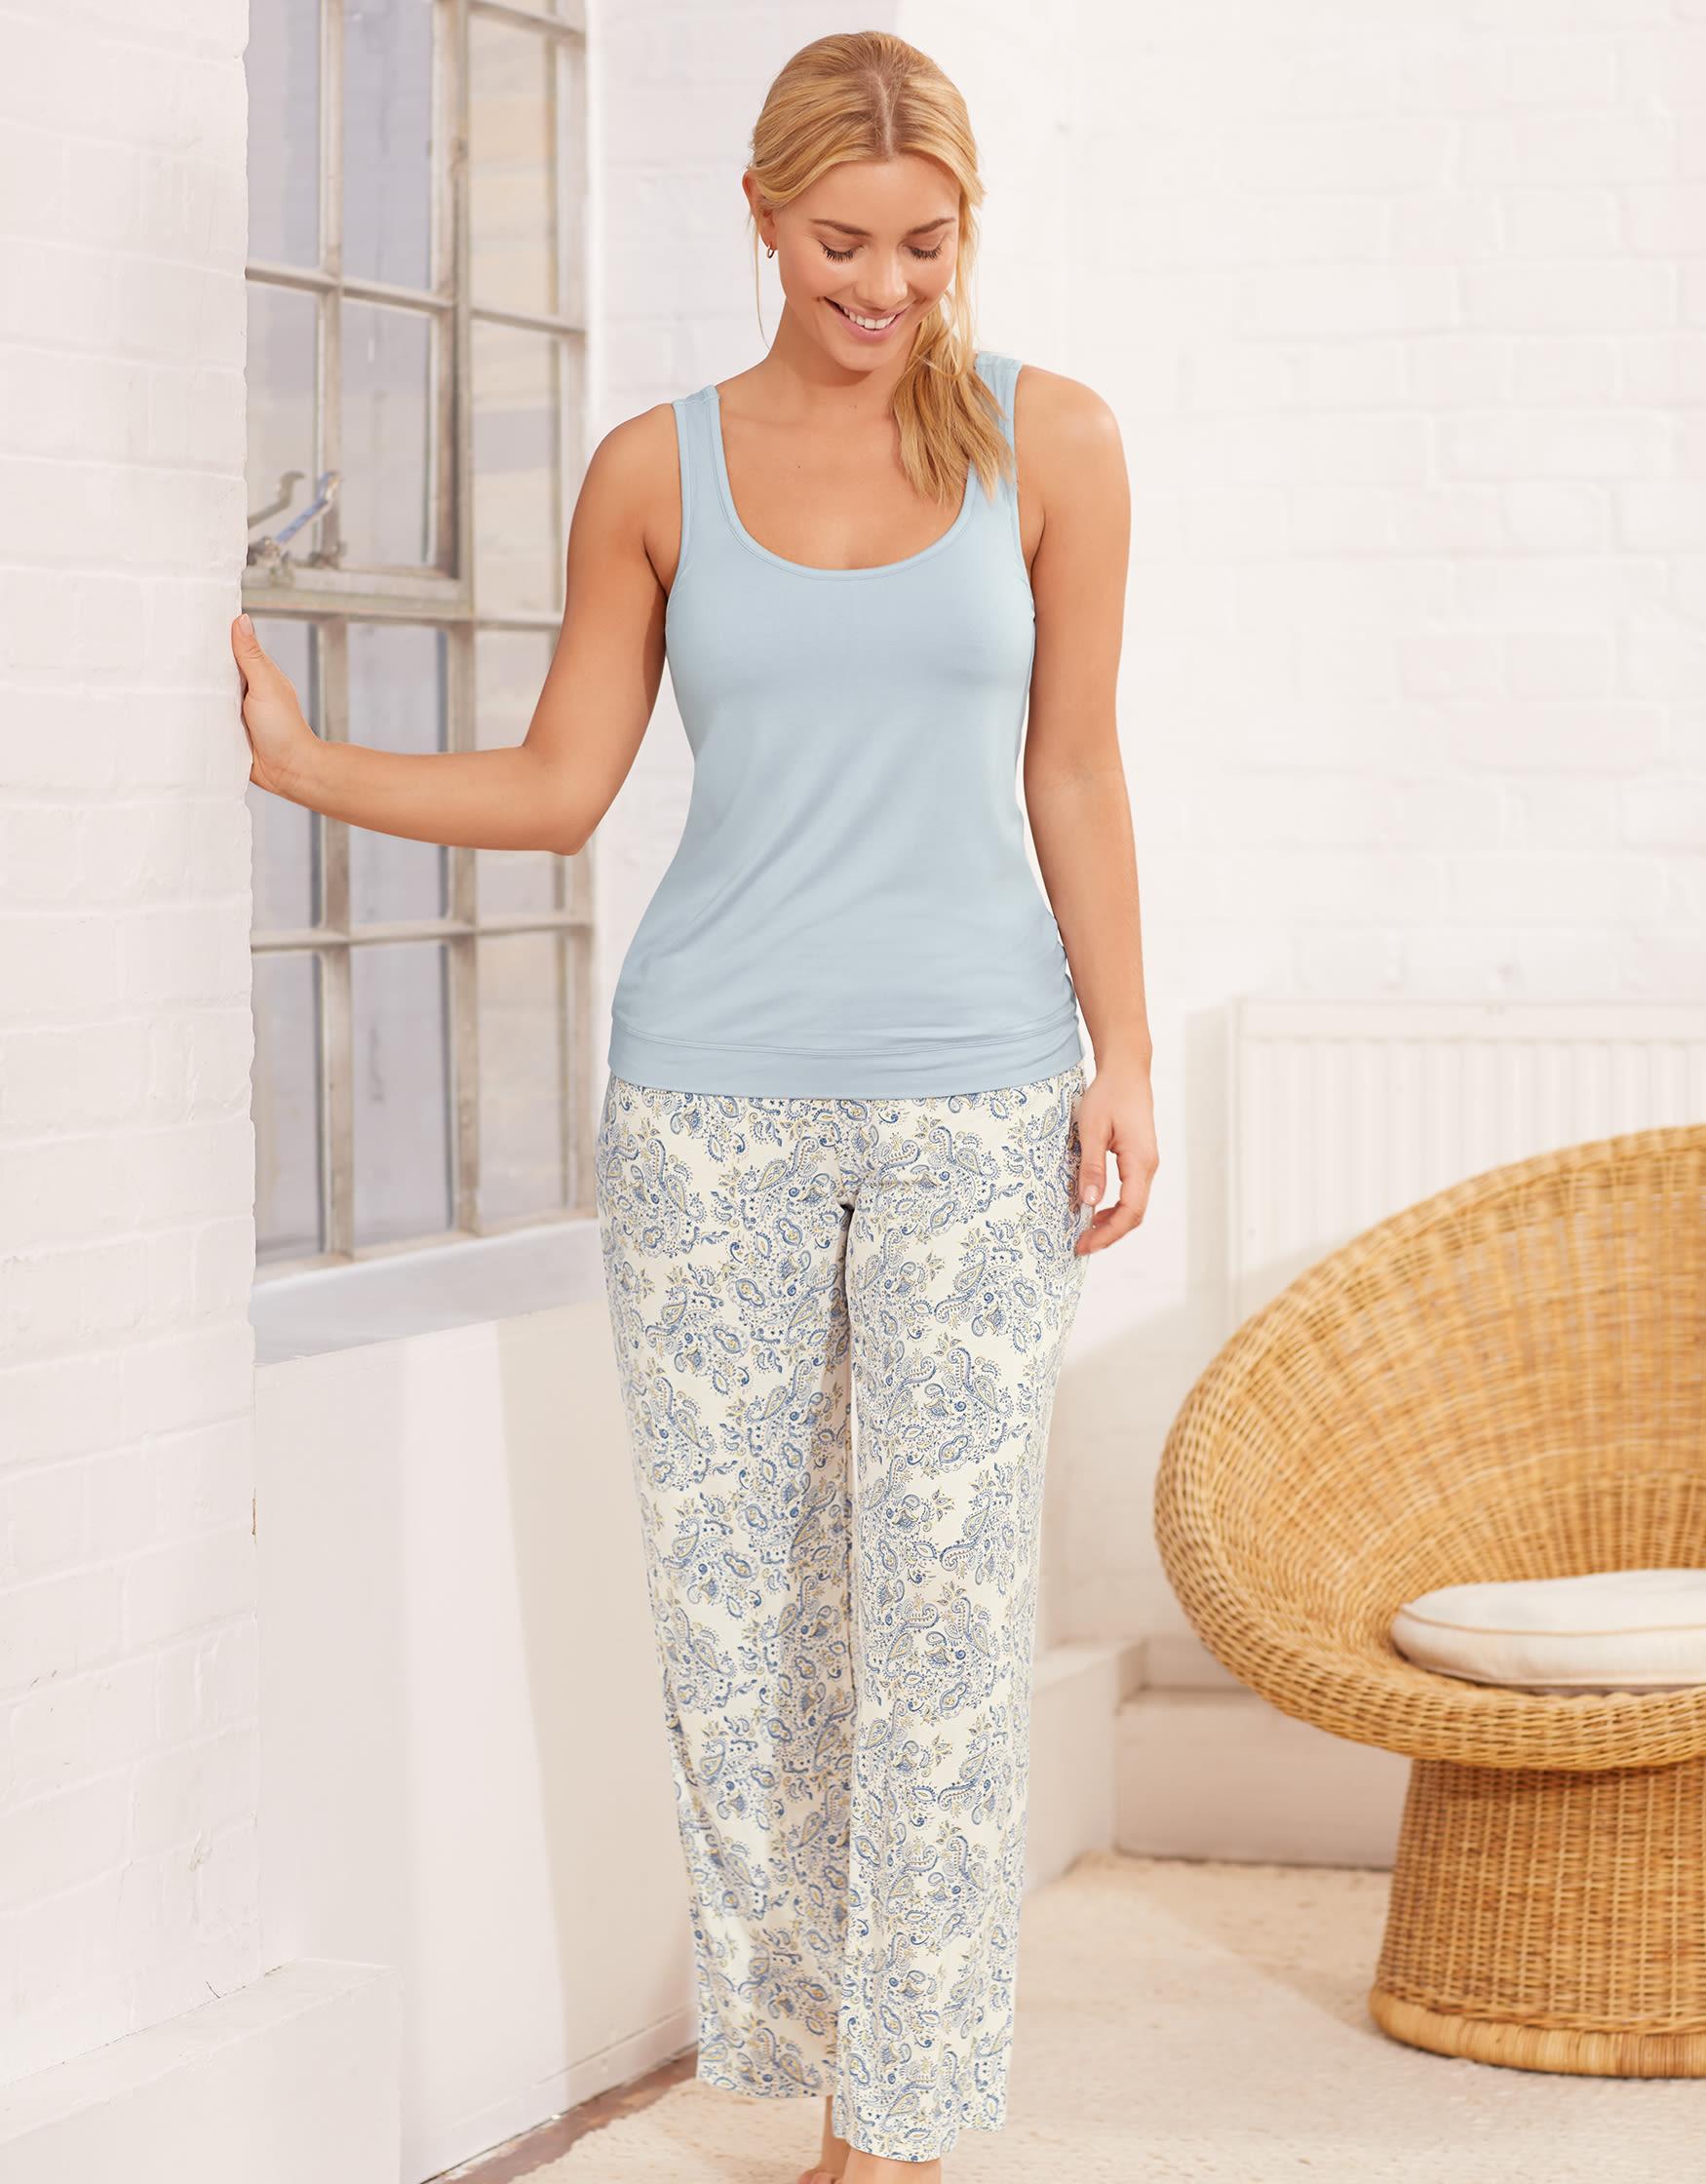 9adcea7c534 Pyjamas & Nightwear with Bra Support | Supportive Sleepwear | Bravissimo